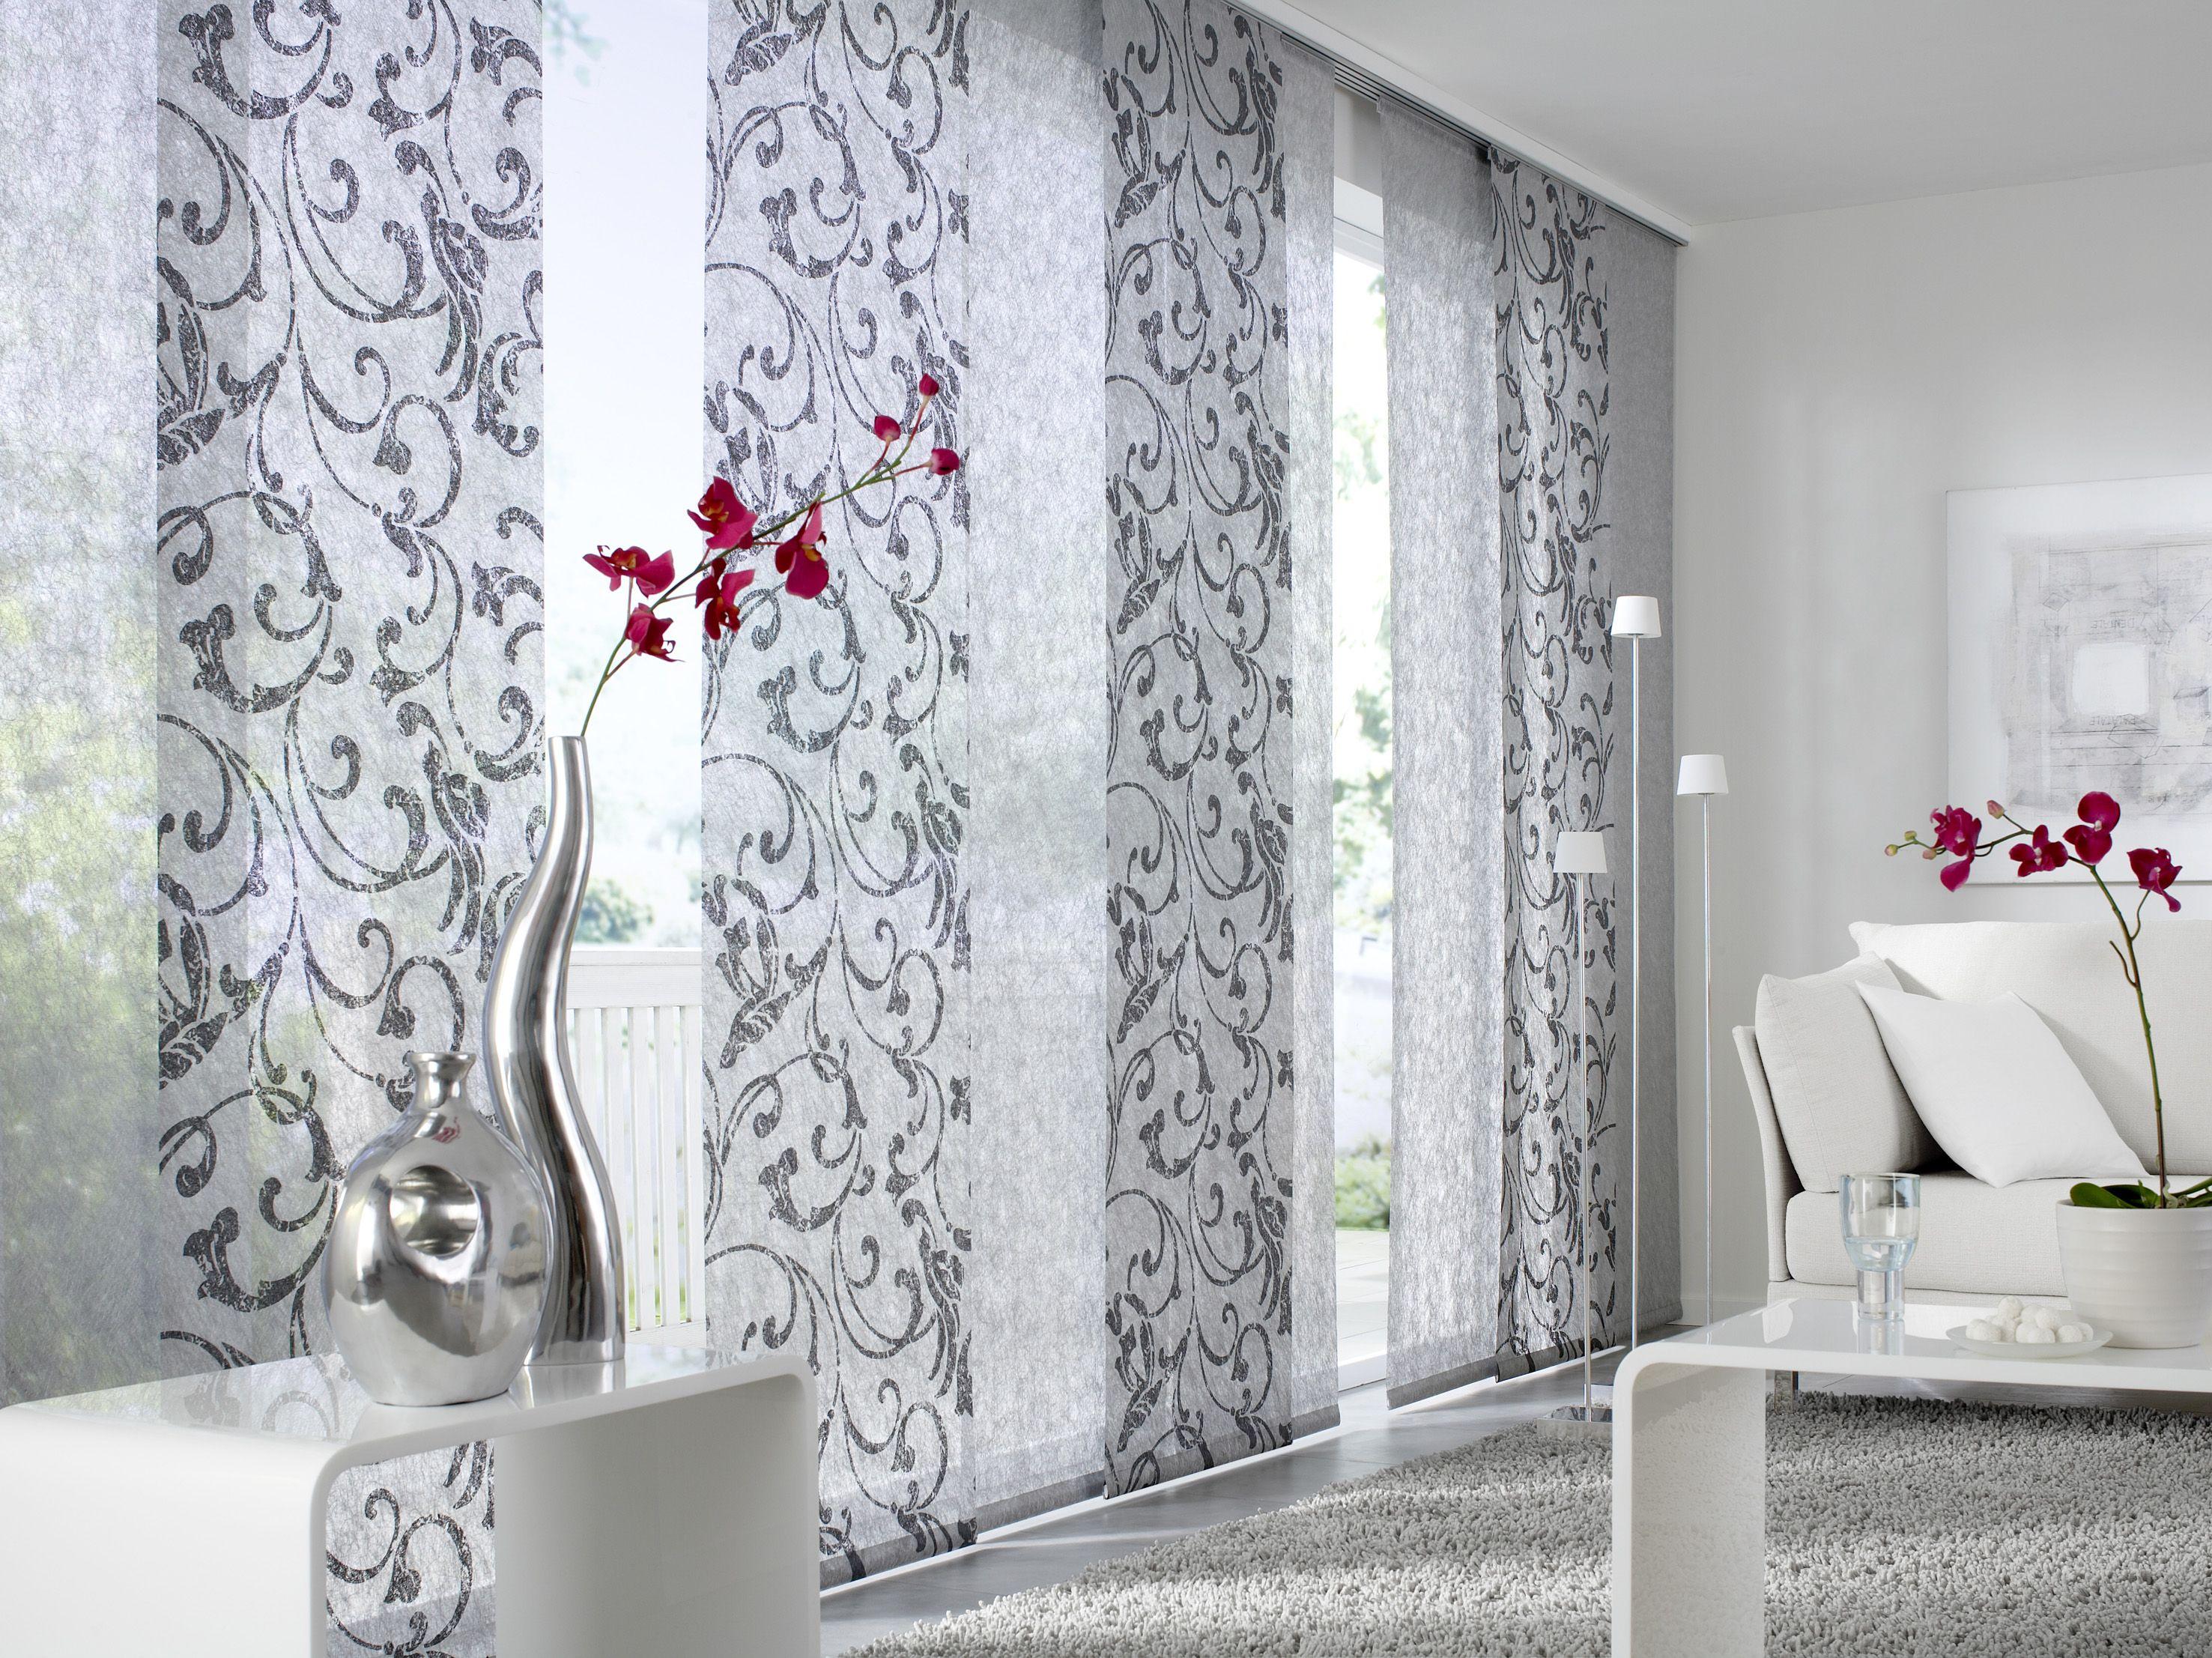 Zebra Perde Modelleri curtain models 2015 | rideau | Perde ...